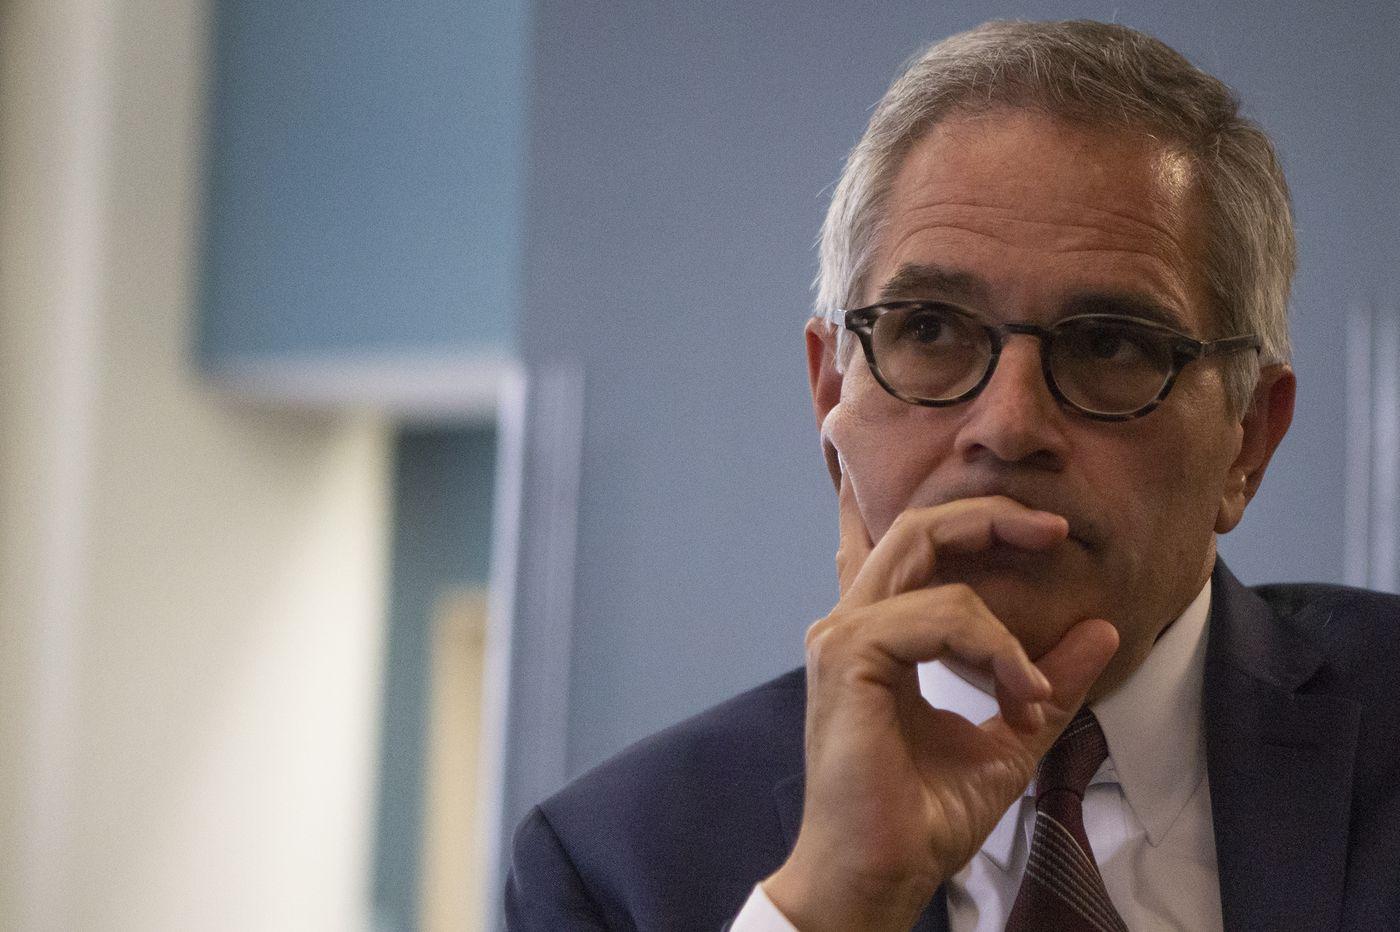 By publicizing distasteful 'office joke,' DA Larry Krasner crossed an ethical line | Opinion